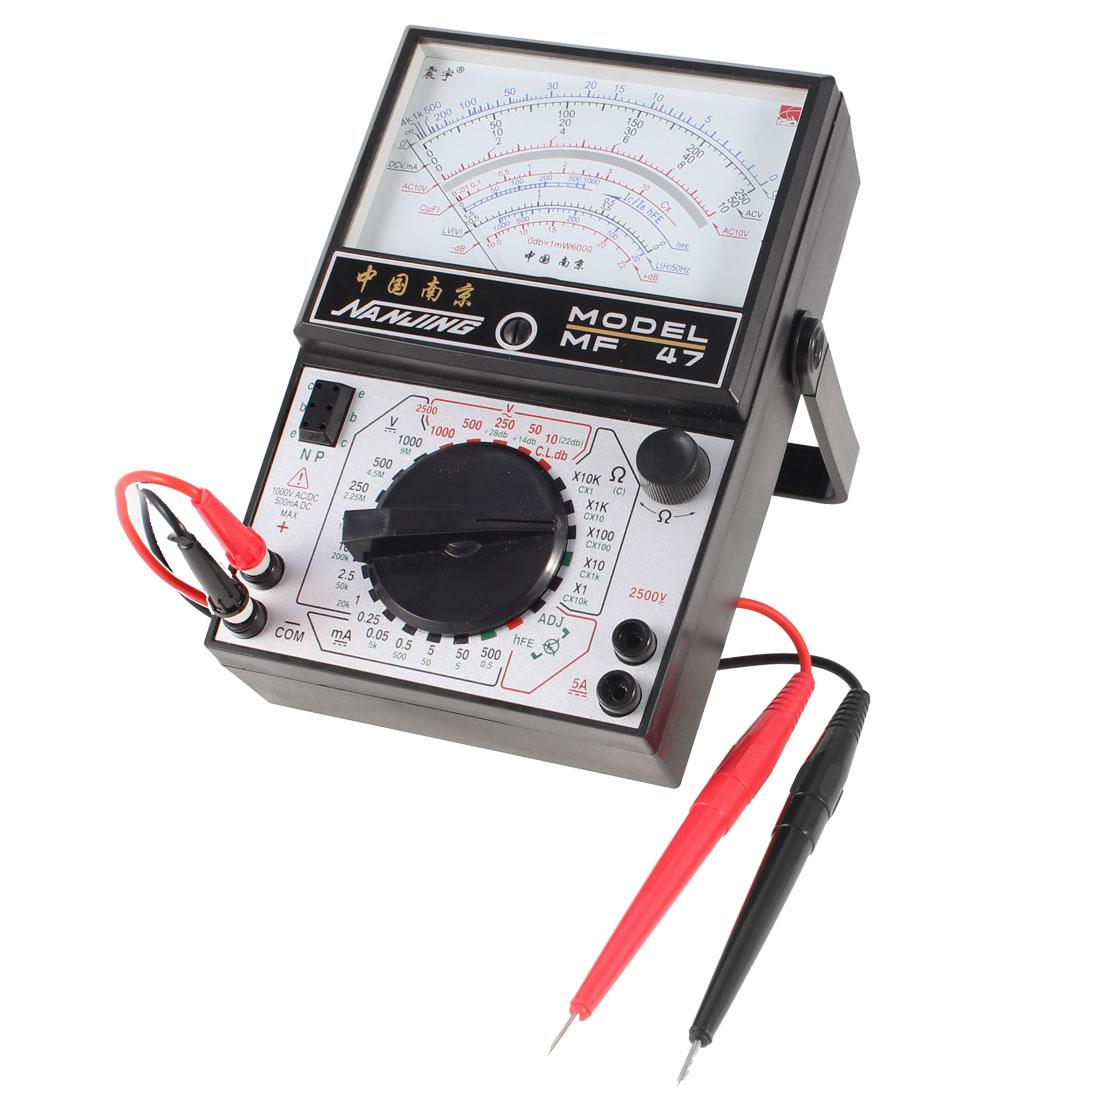 AC DC Voltmeter Ammeter Ohmmeter Capacitance MF47 Meter Multimeter